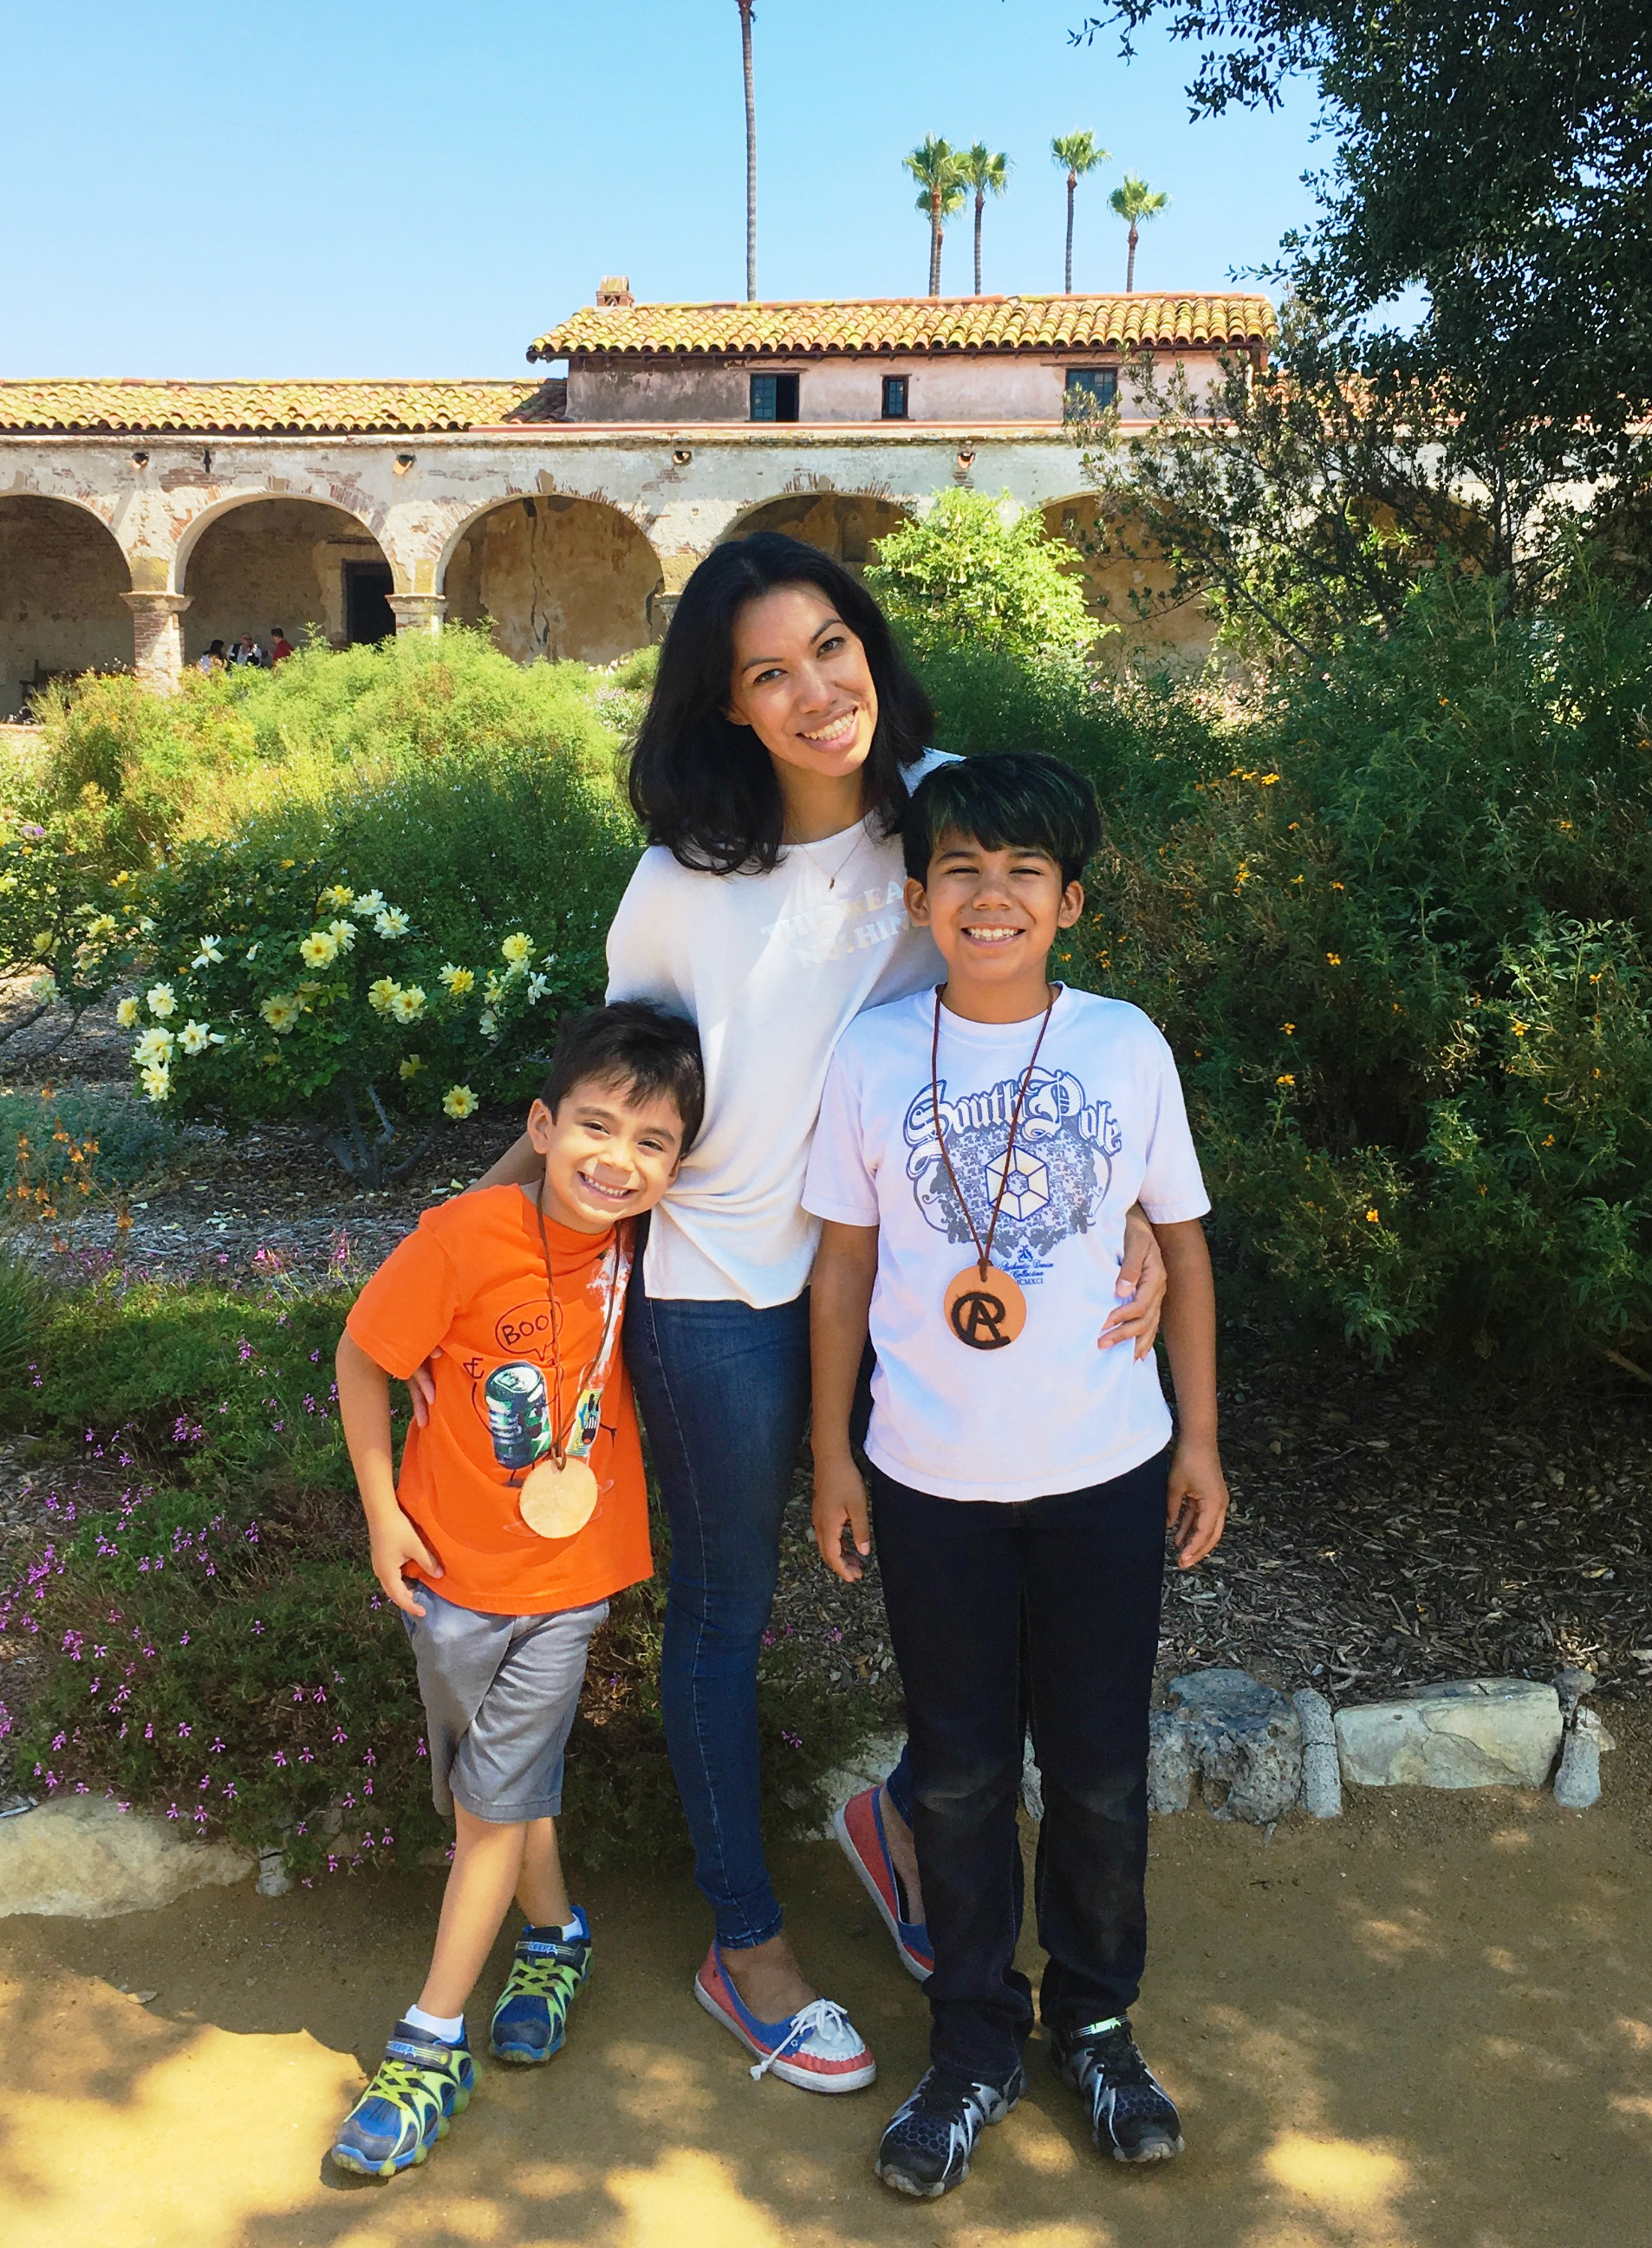 Visiting Mission San Juan Capistrano with kids - LivingMiVidaLoca.com